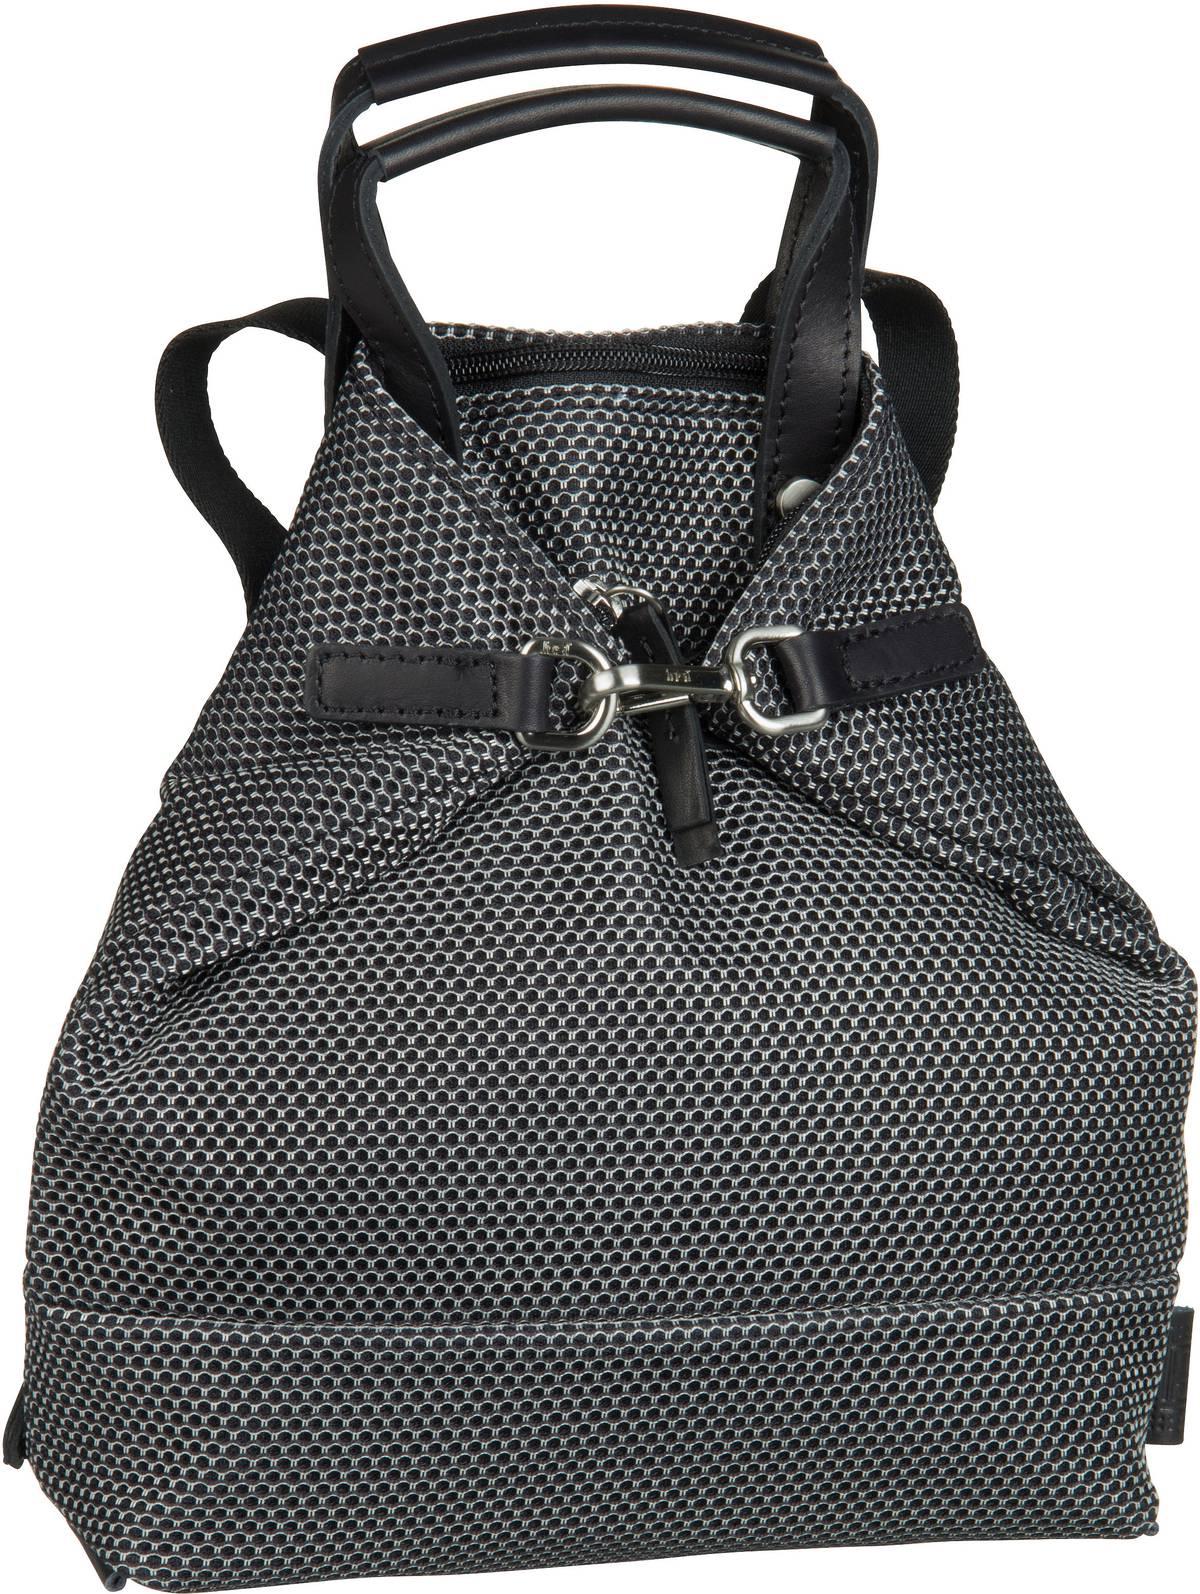 Rucksack / Daypack Mesh 6176 X-Change Bag Mini Silver